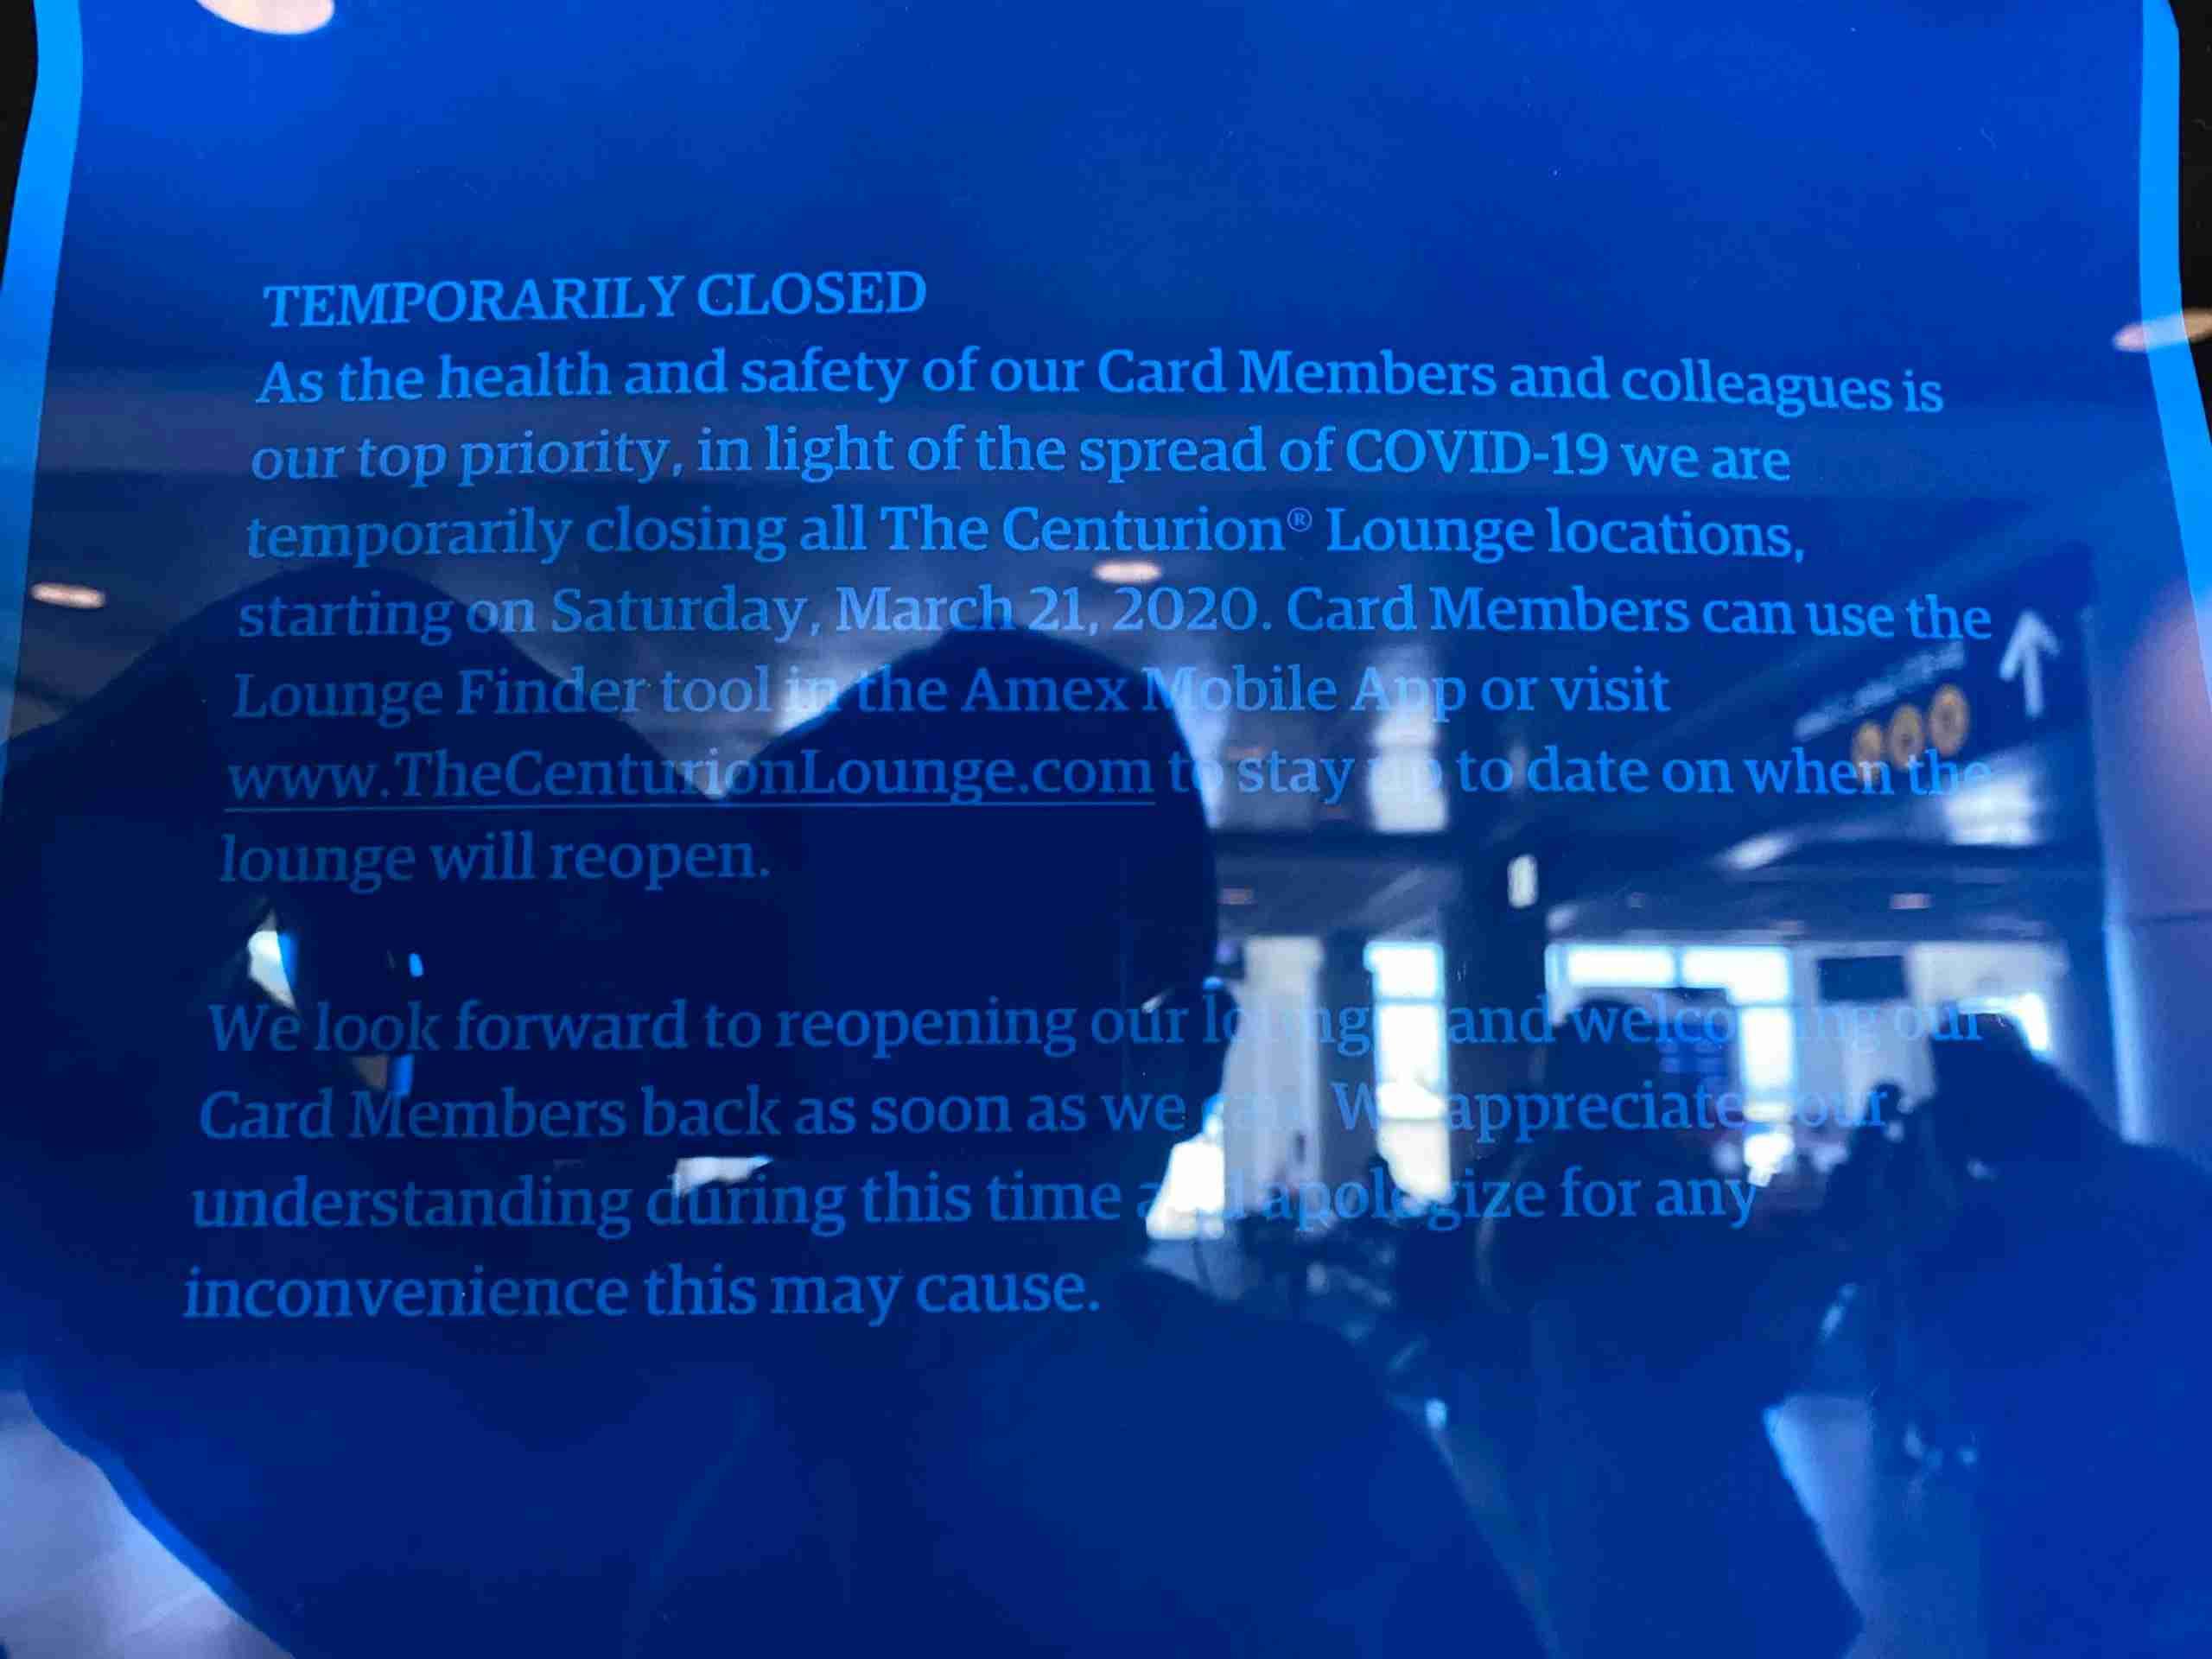 American Express Centurion Lounge closure in Seattle.